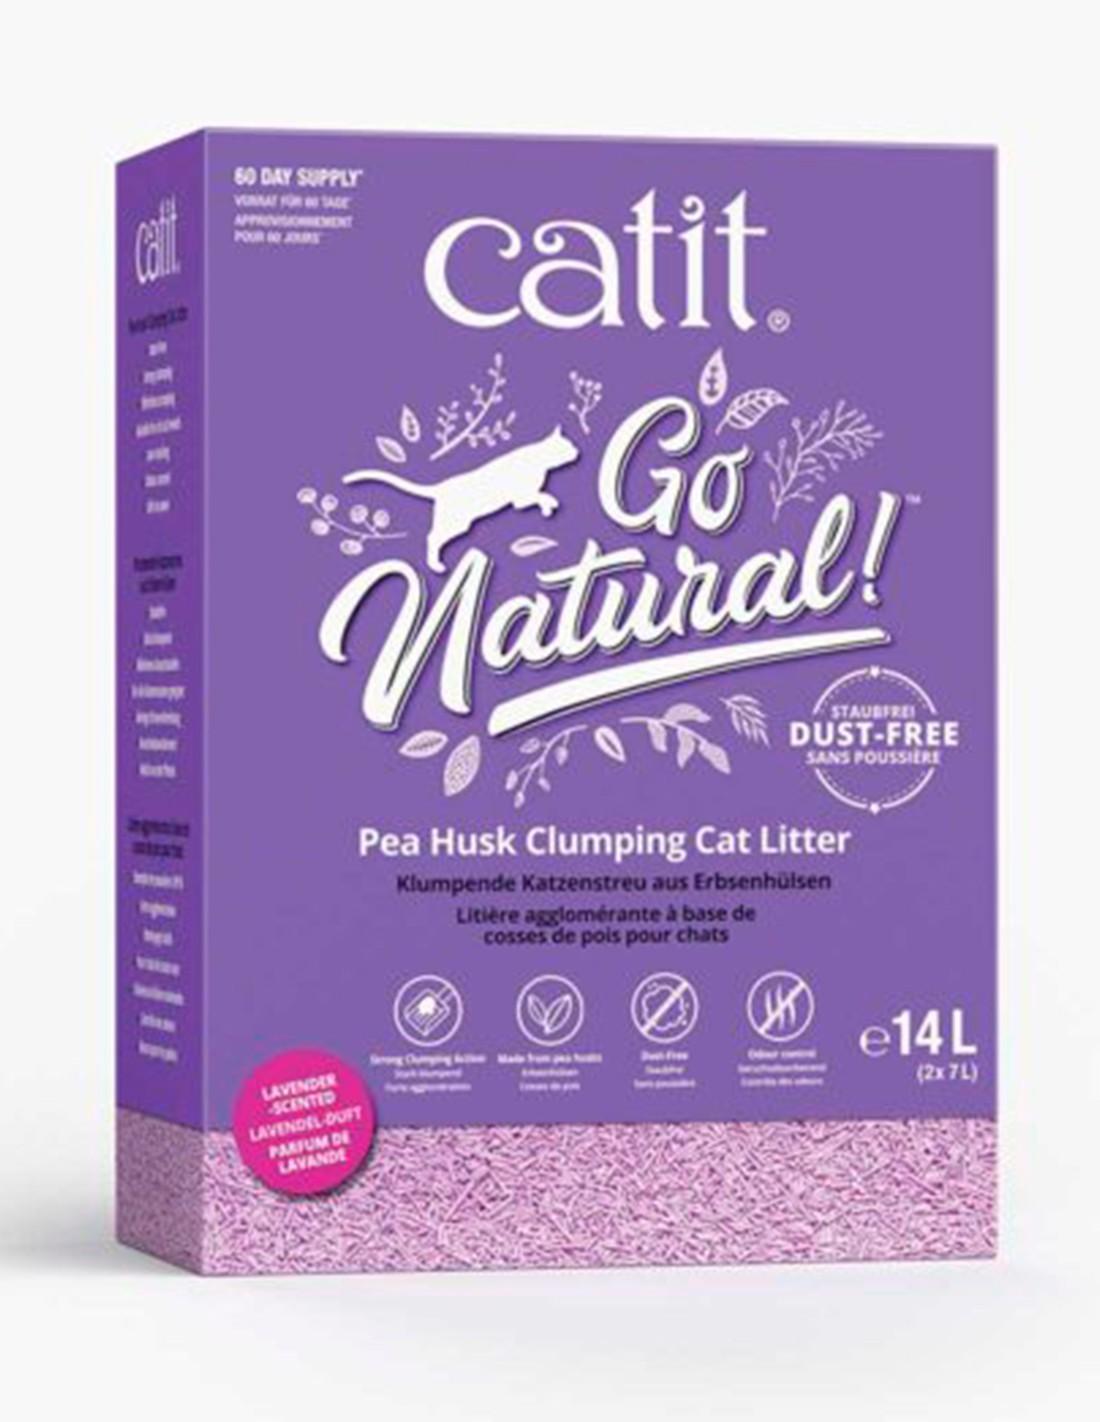 Catit Go Natural! Arena ECO de Guisante Lavanda 2x7L gatos